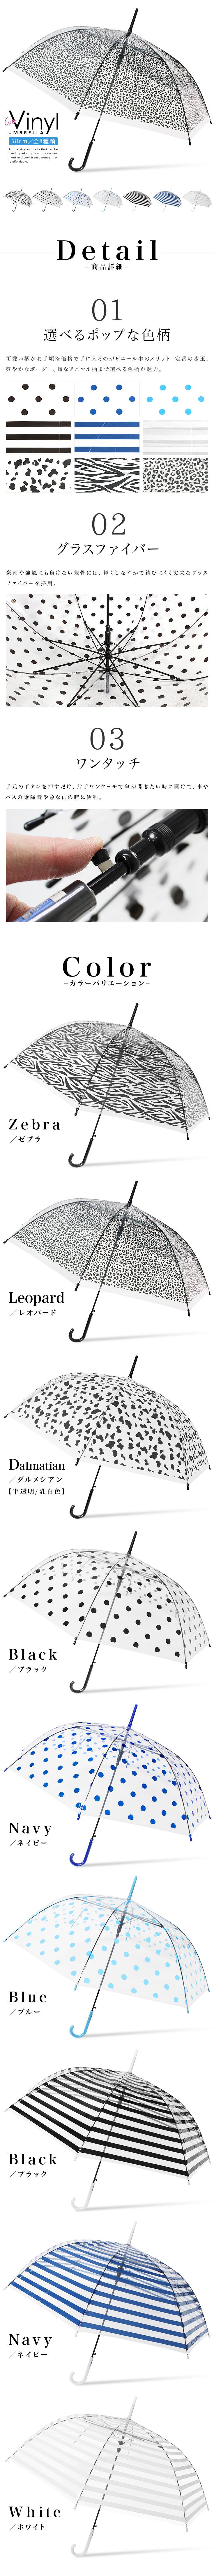 SIZE58cm可愛いビニール傘